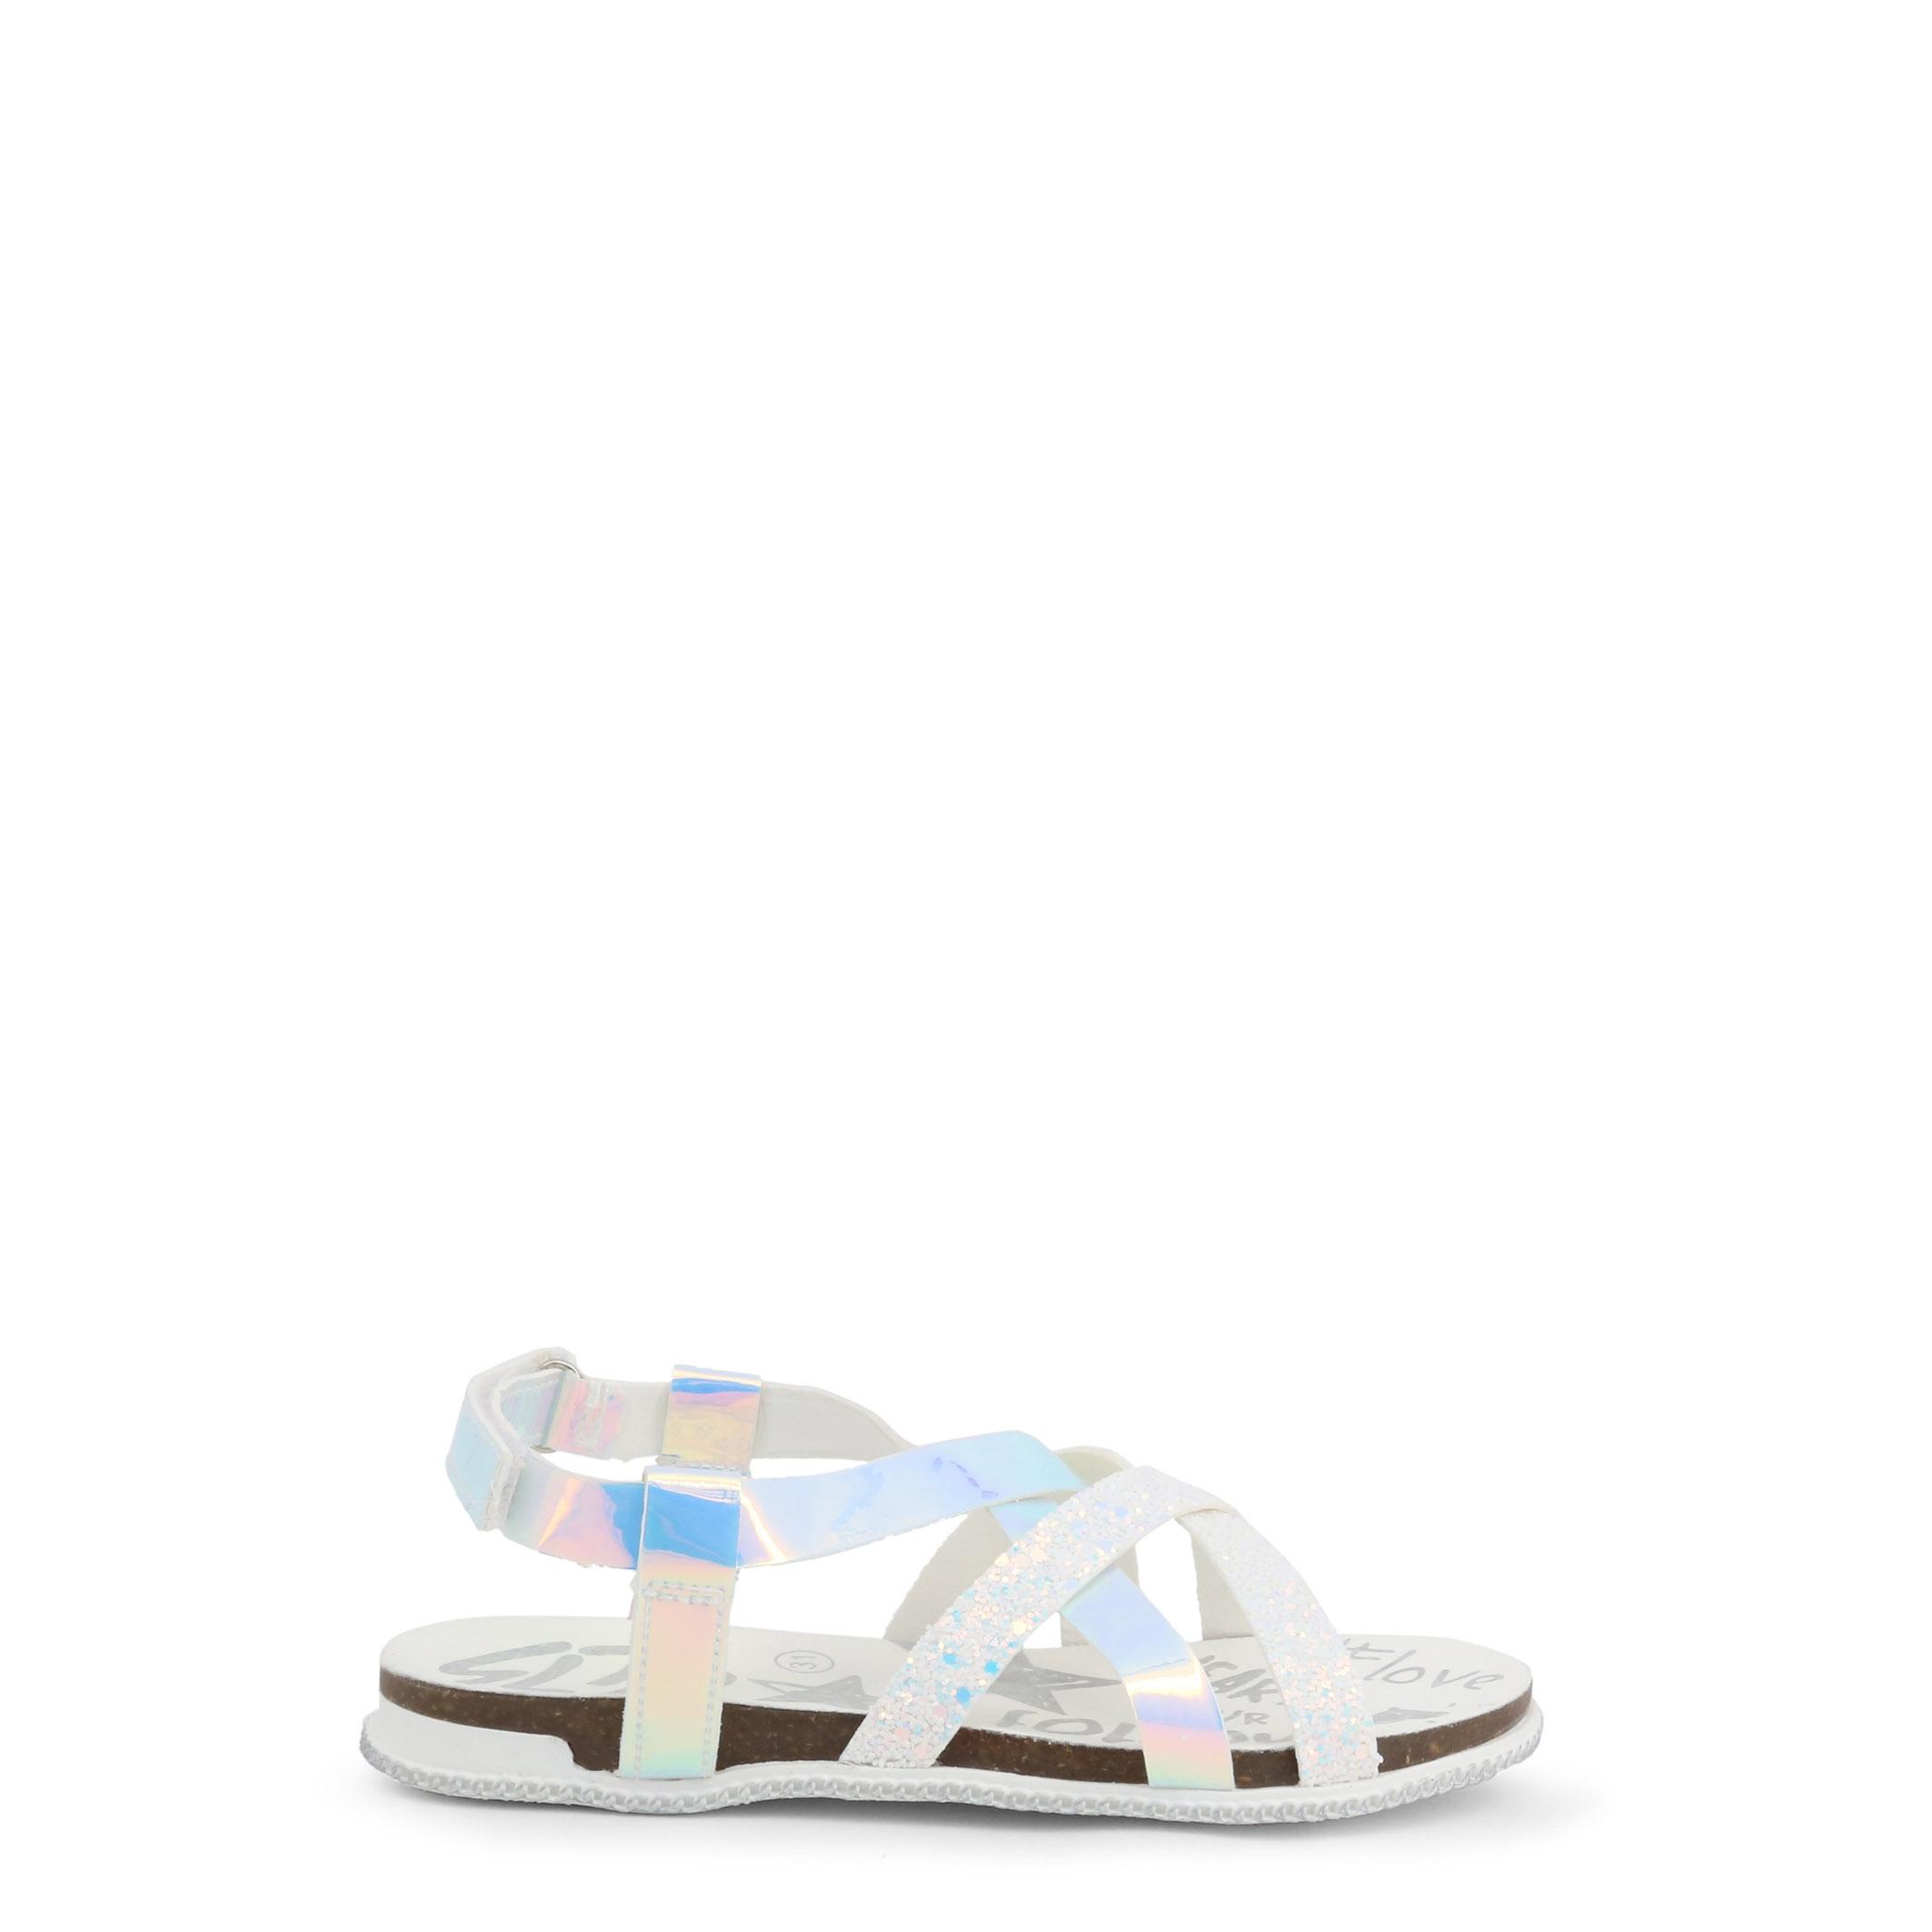 Sandale Shone L6133-032 Alb